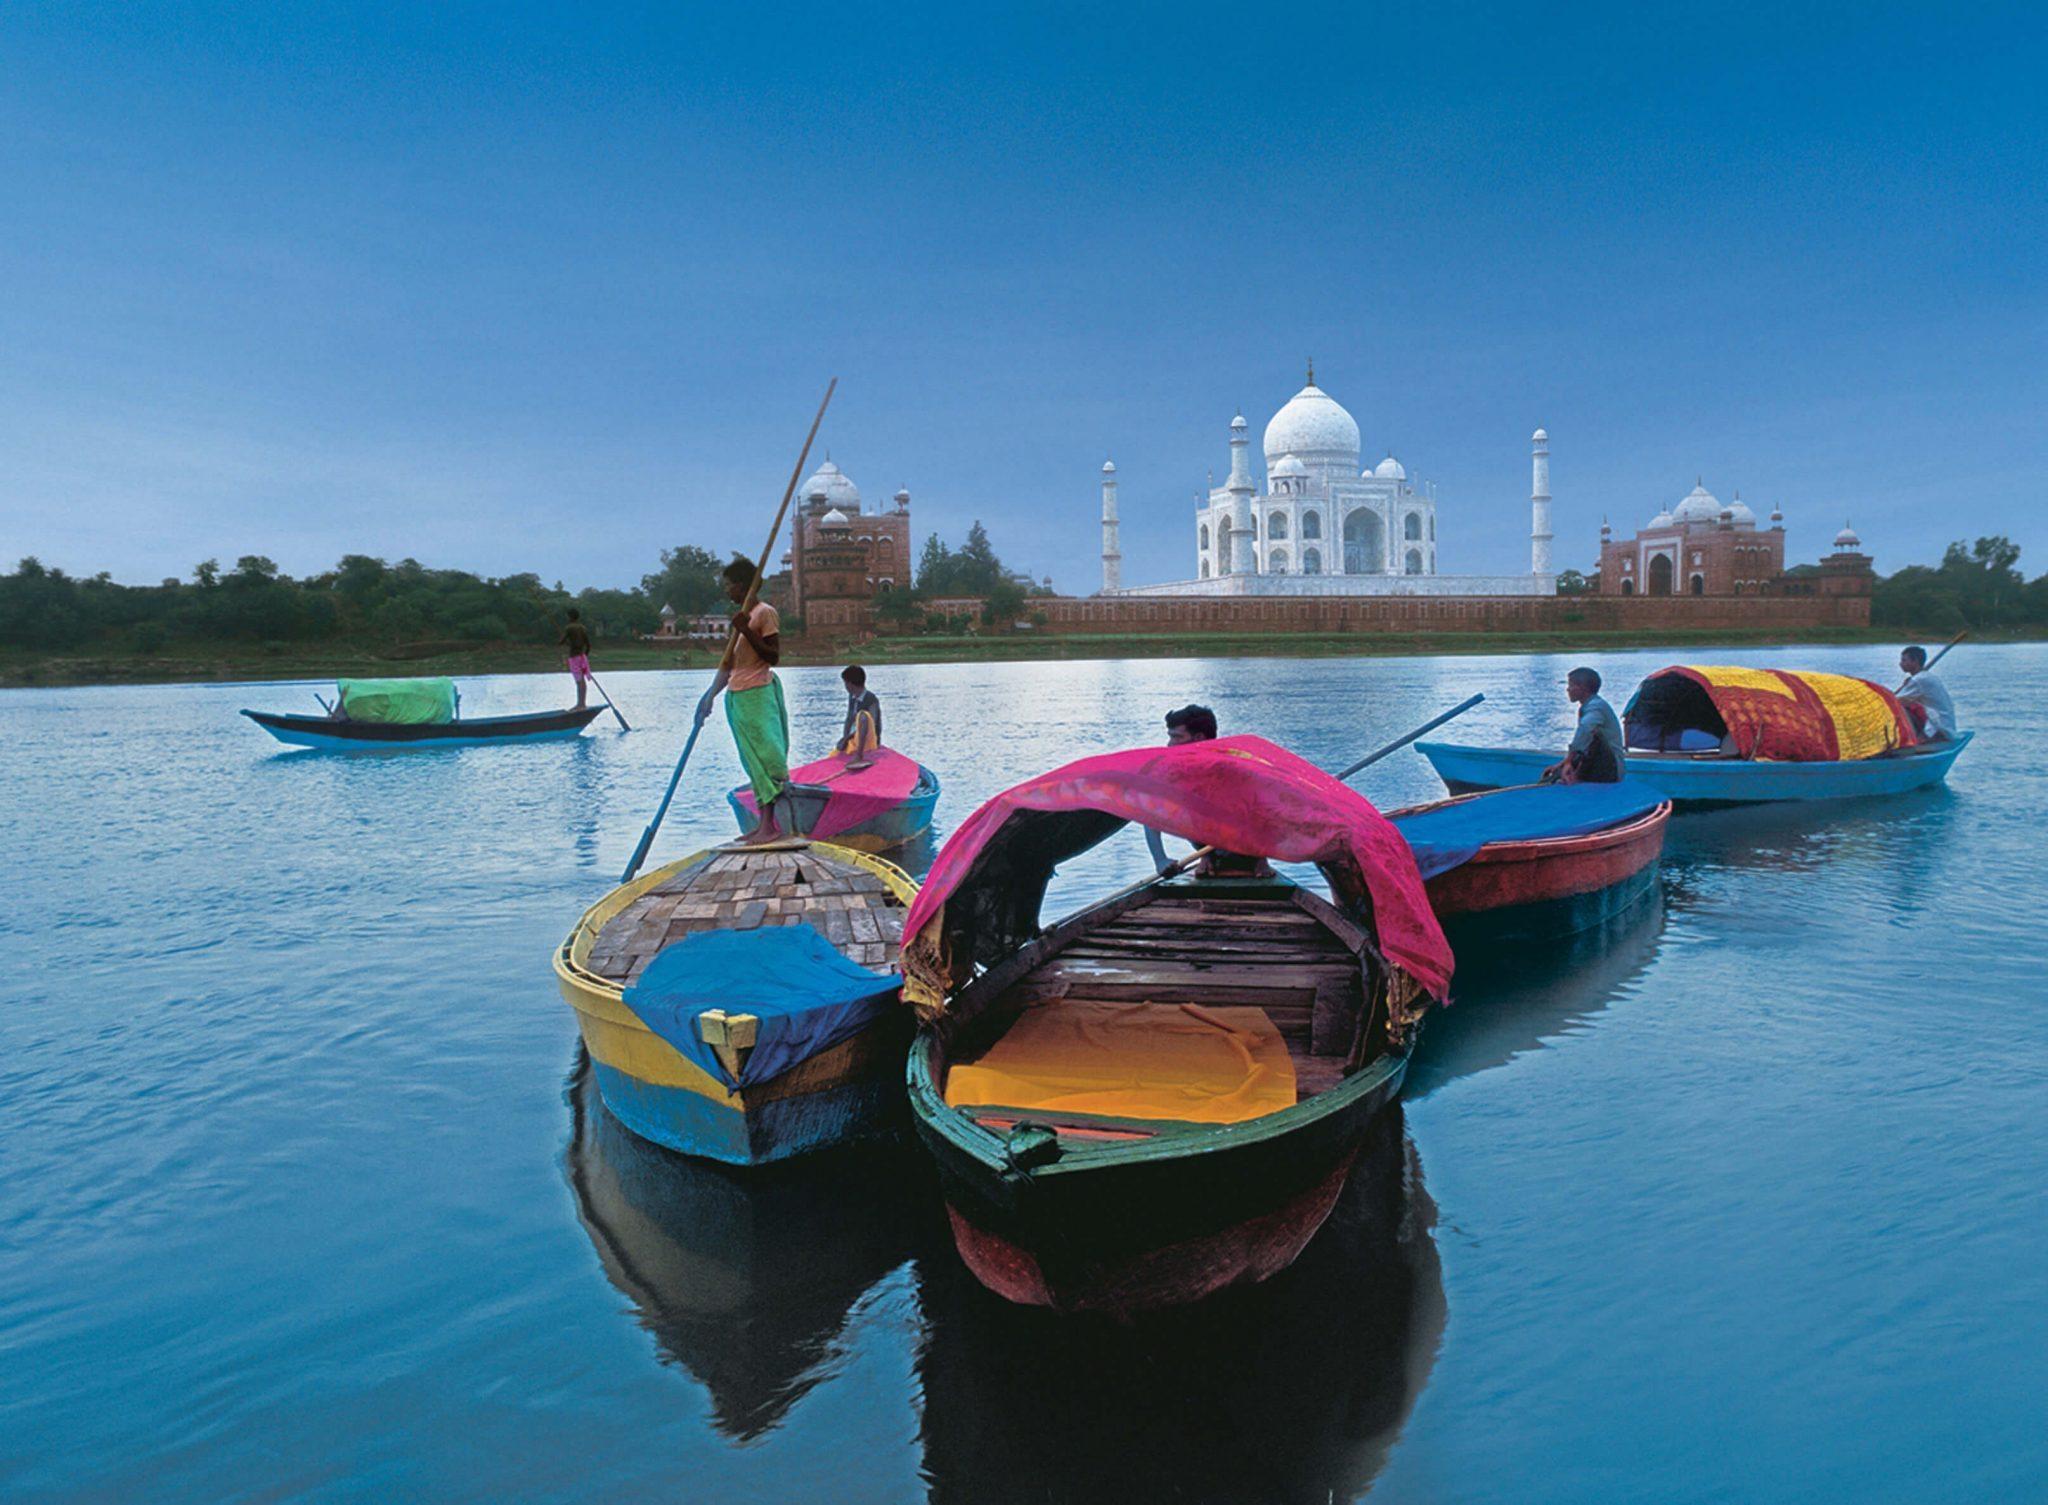 Men in boats cross the river, ahead of the Taj Mahal